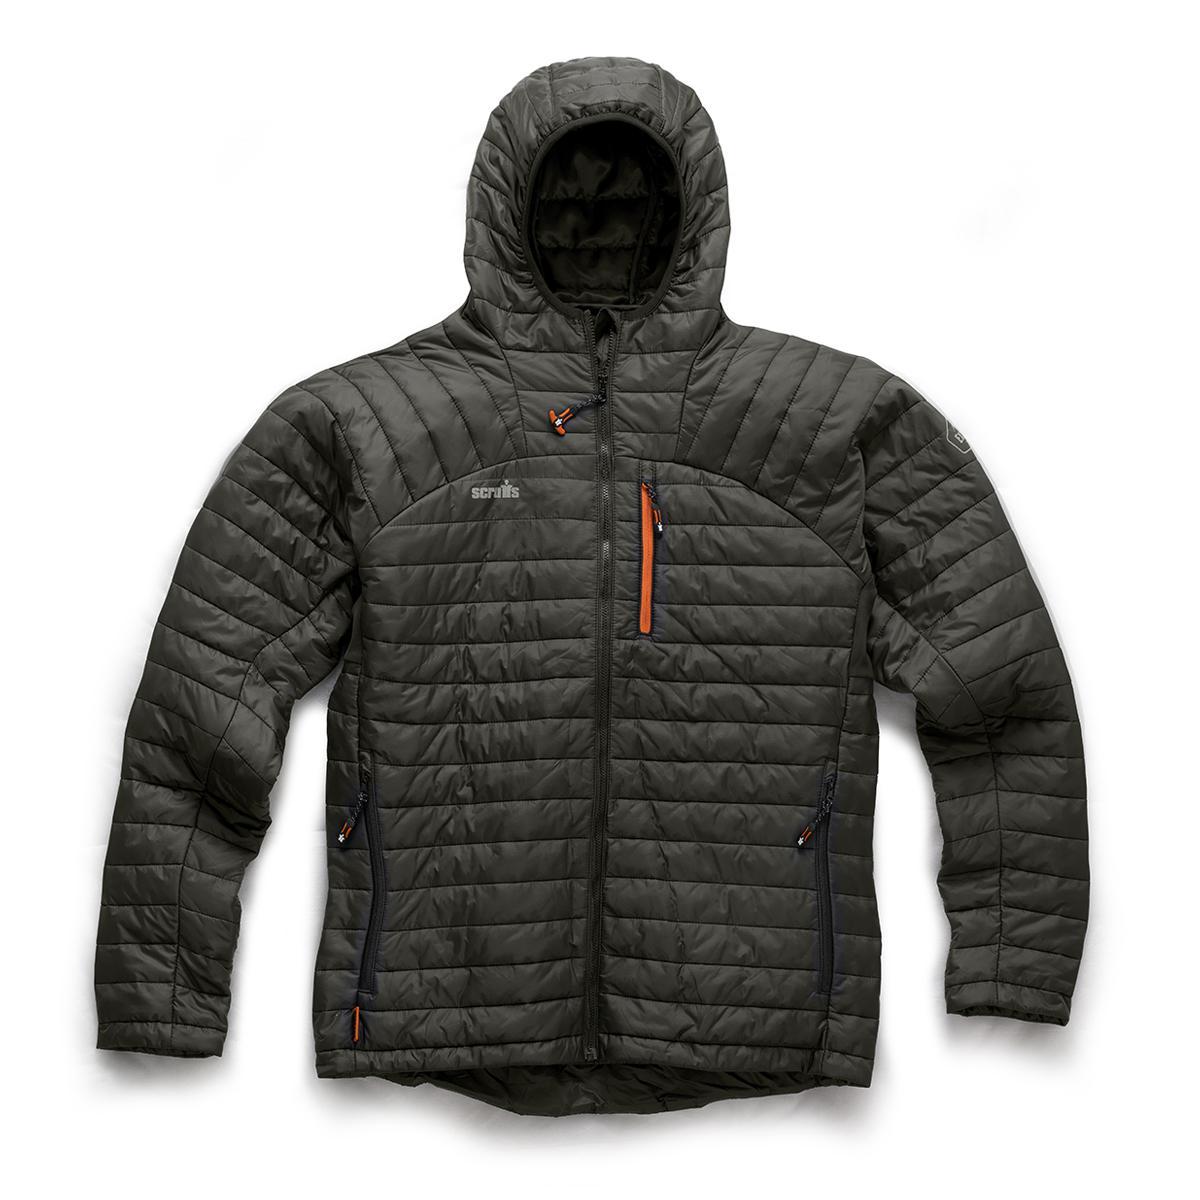 Expedition Thermo Heavy Duty Jacket